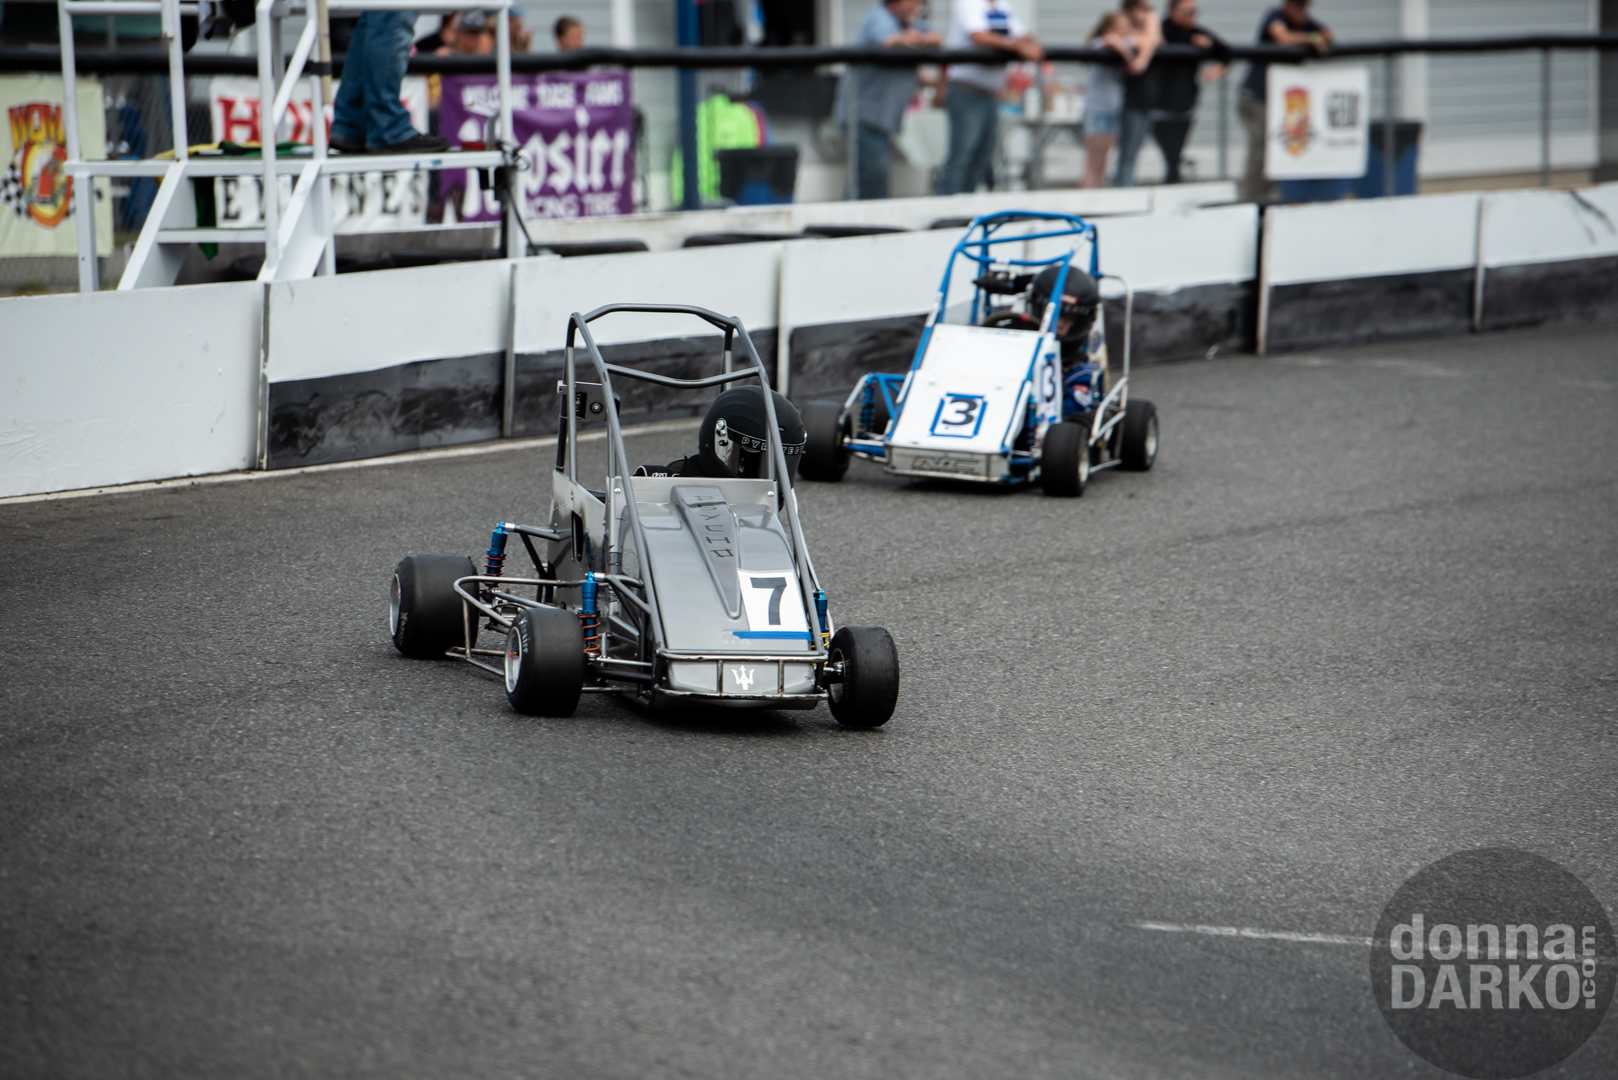 QWMA (Racing) 8-11-2019 DSC_7568.jpg